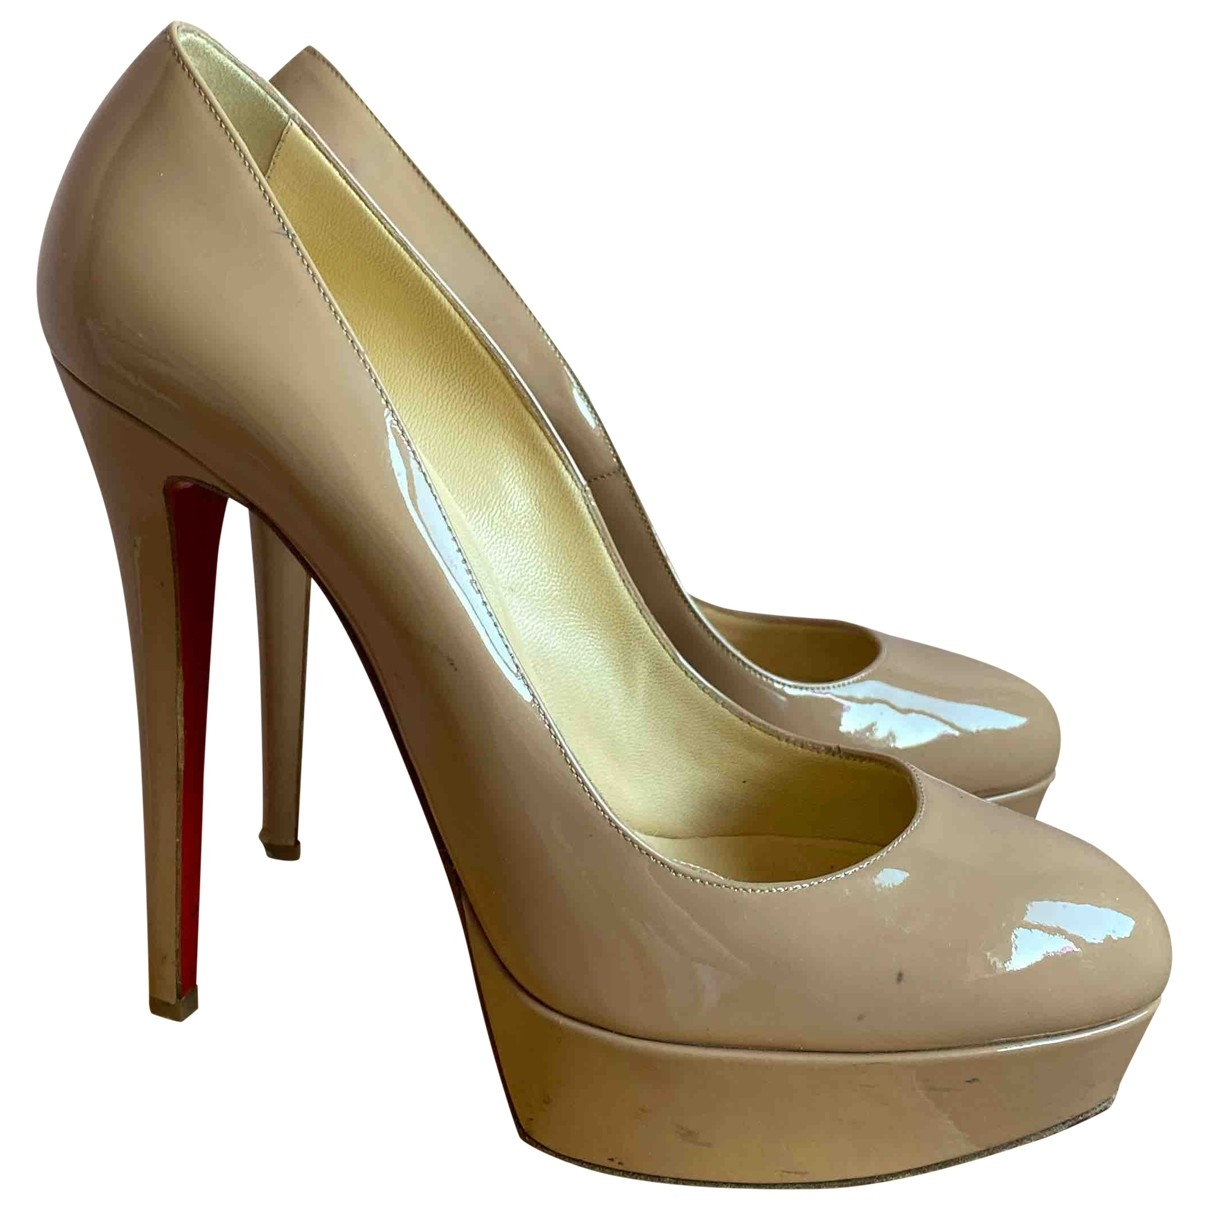 Christian Louboutin Bianca Beige Patent leather Heels for Women 40 IT